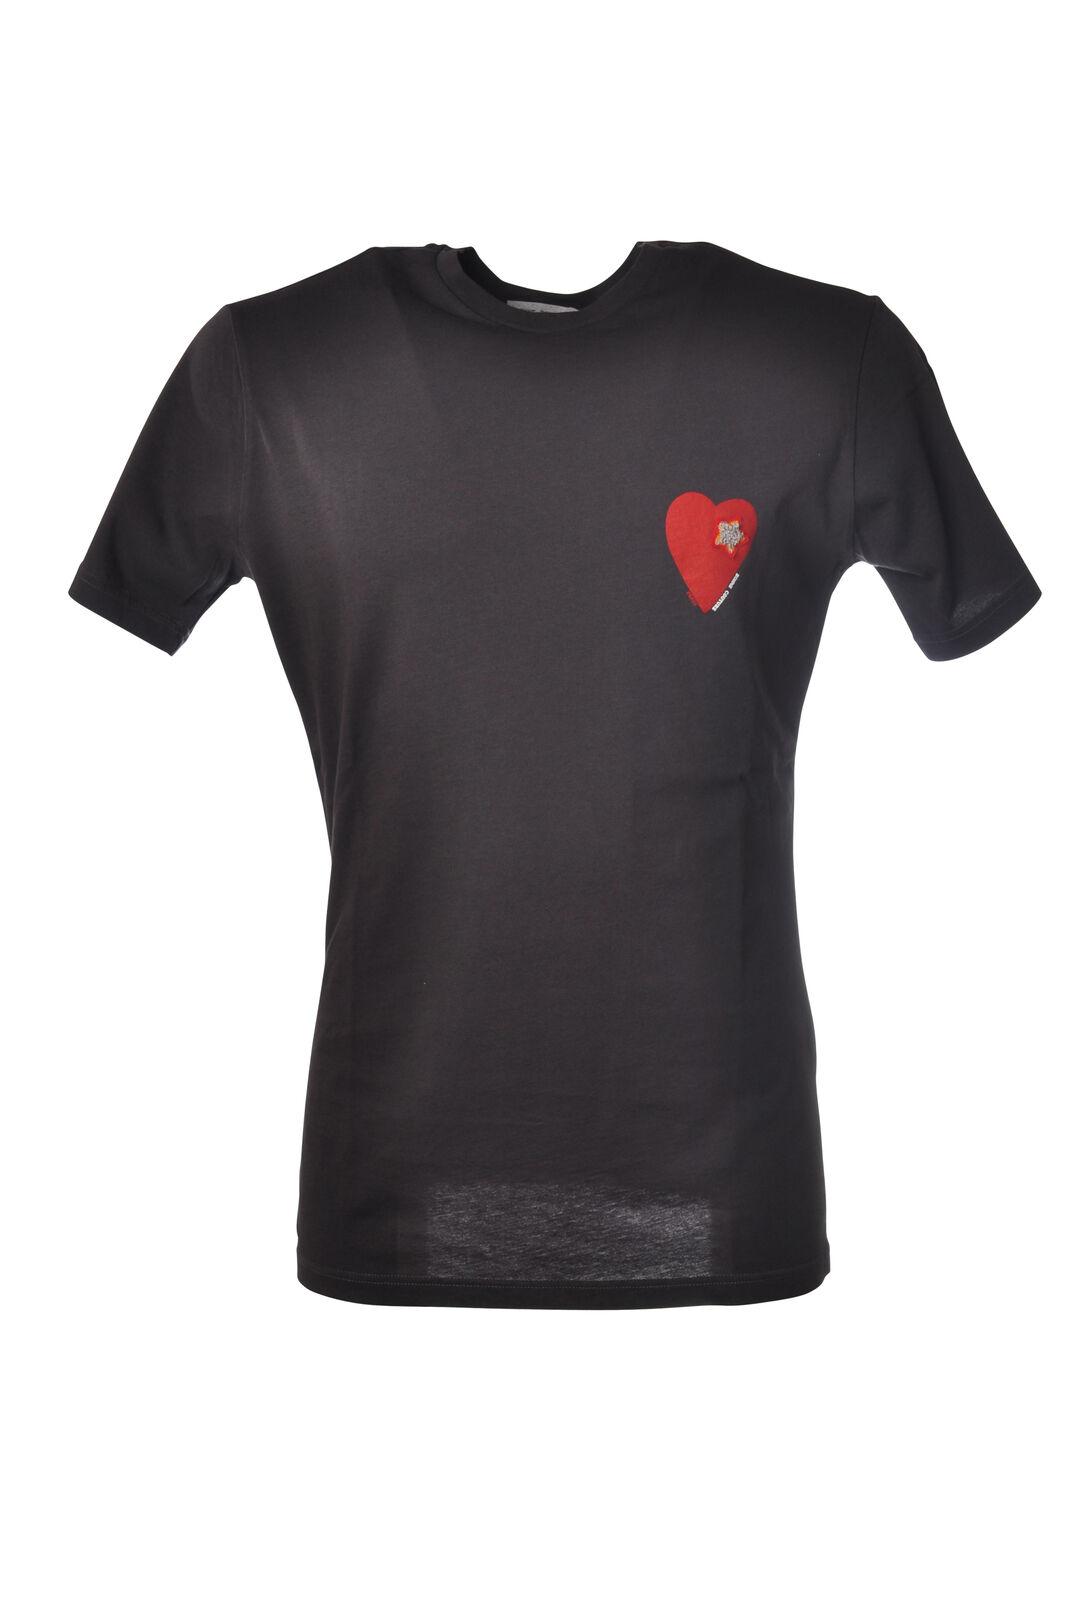 Daniele Alessandrini - Topwear-T-shirts - Man - grau - 5288430F191339